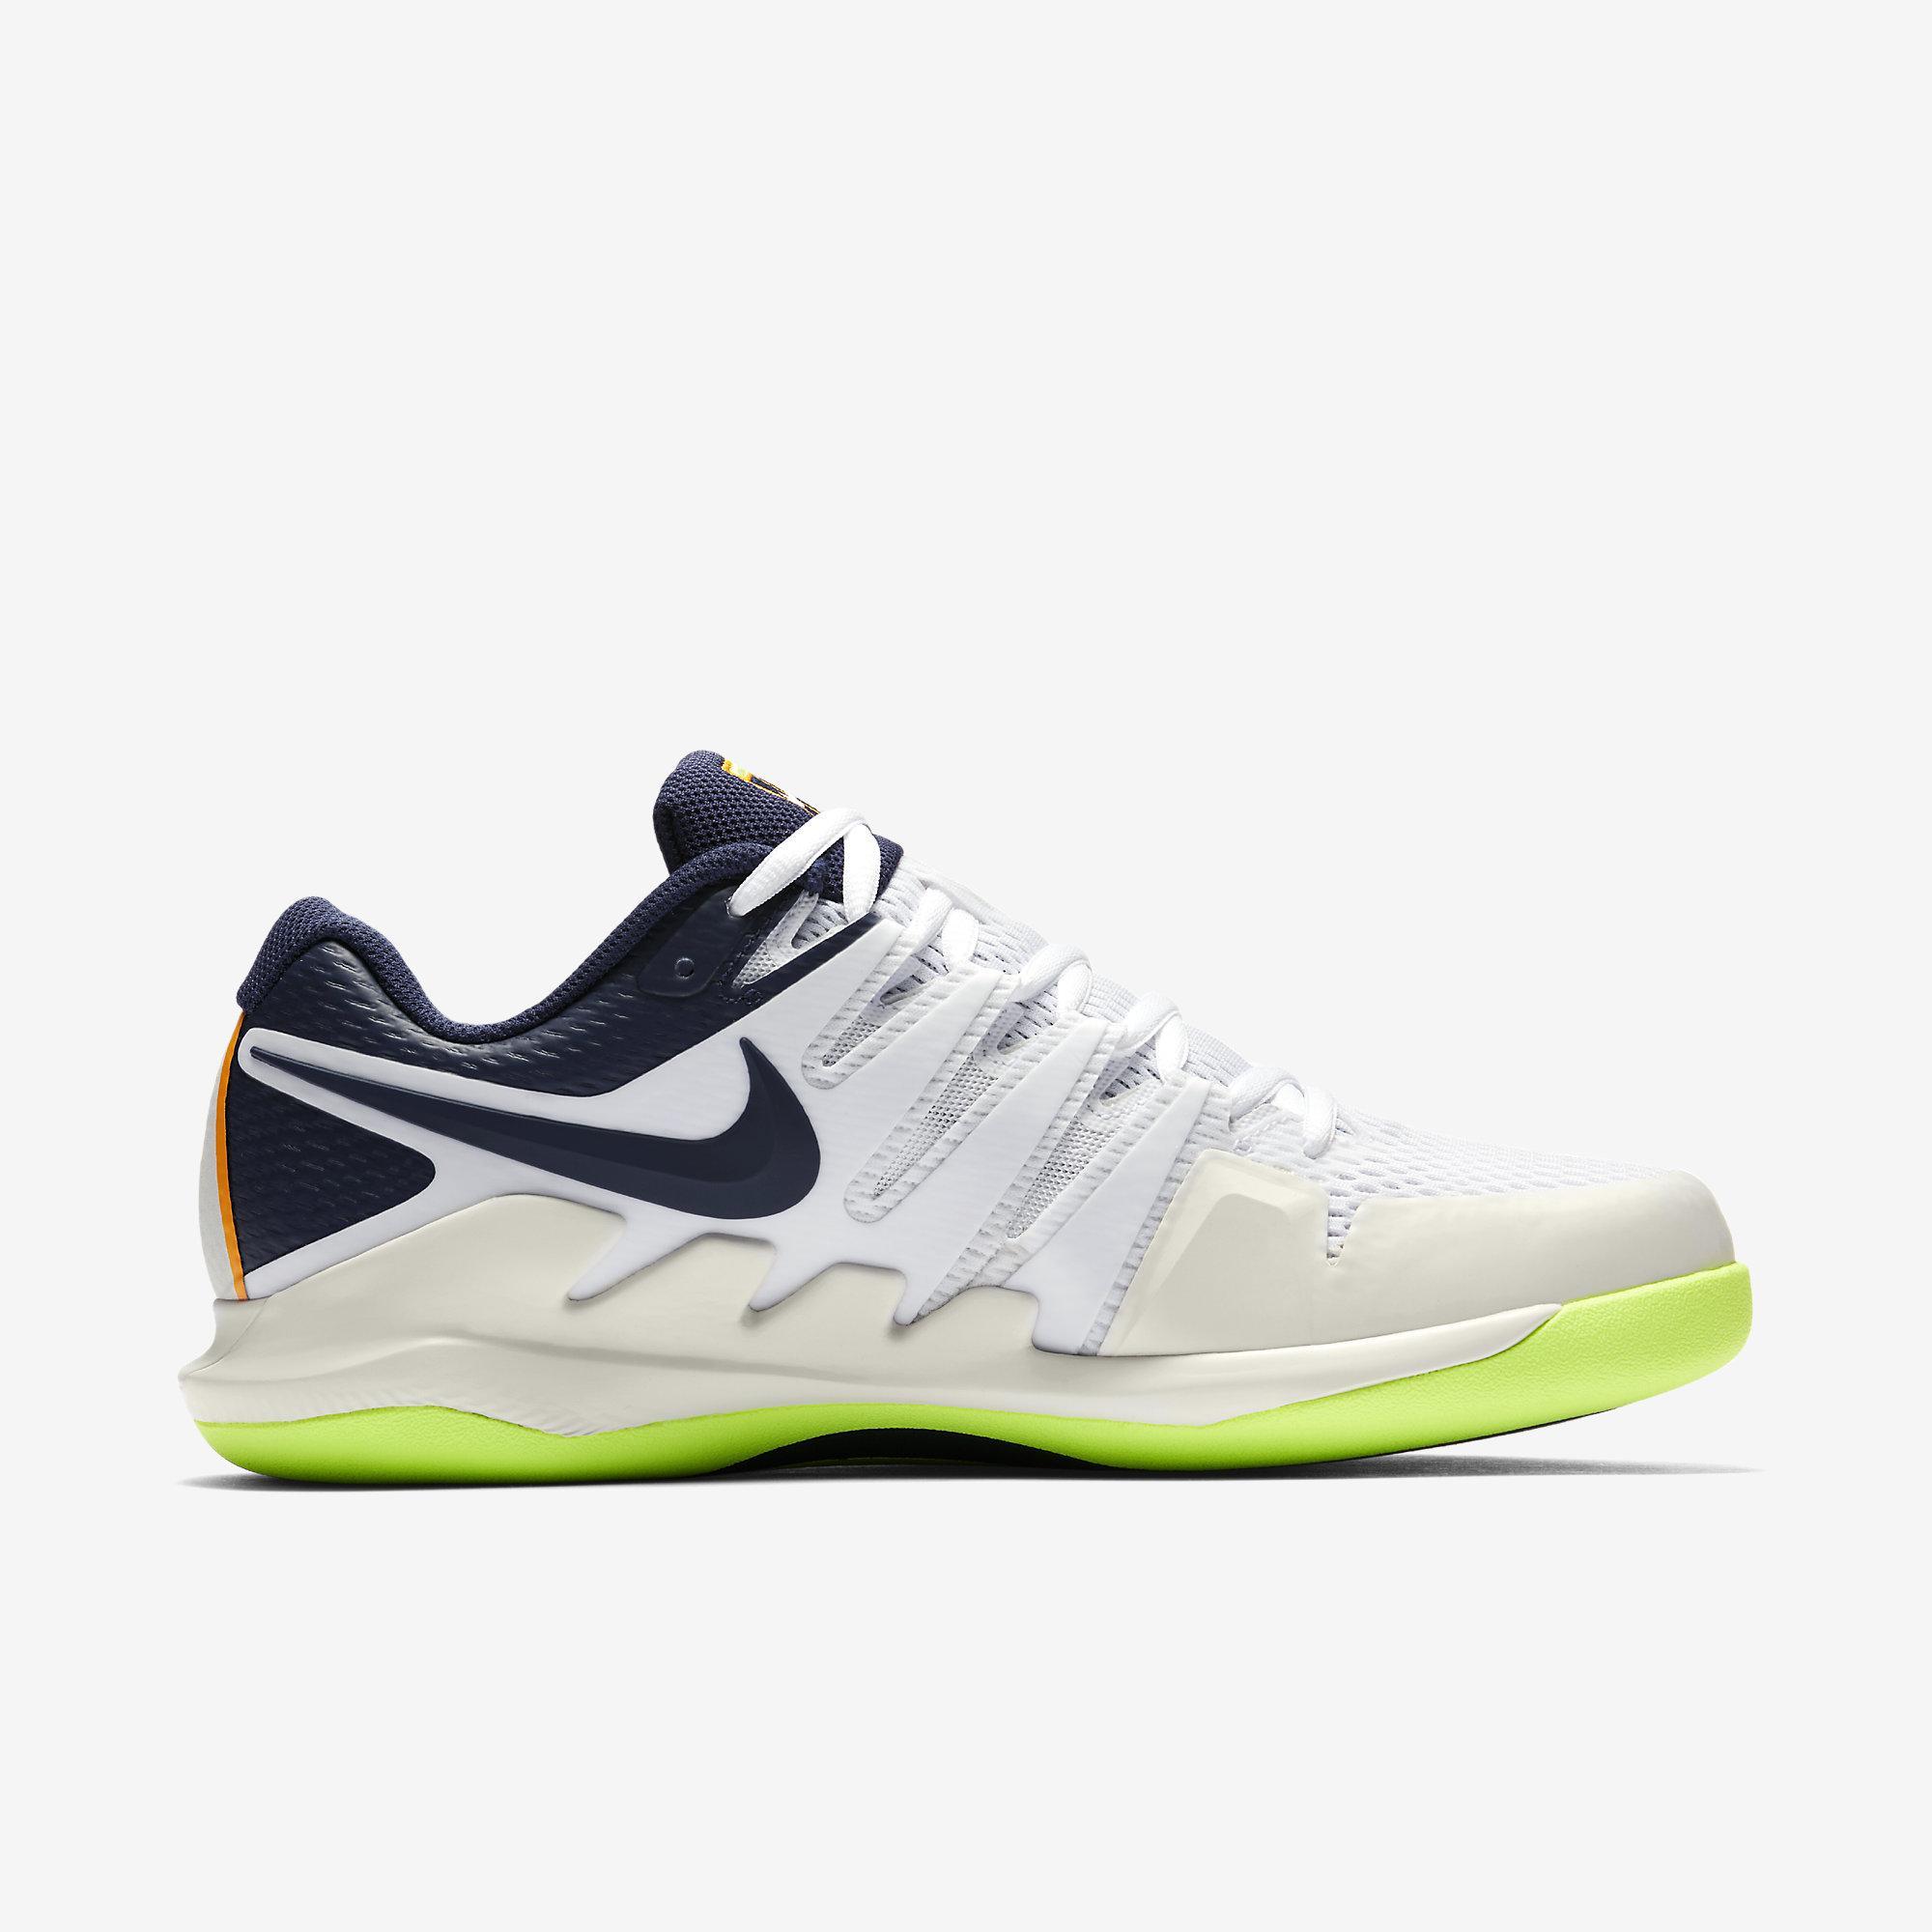 f0df9fec8ad4 Nike Mens Air Zoom Vapor X Carpet Tennis Shoes - Phantom Blackened Blue  White